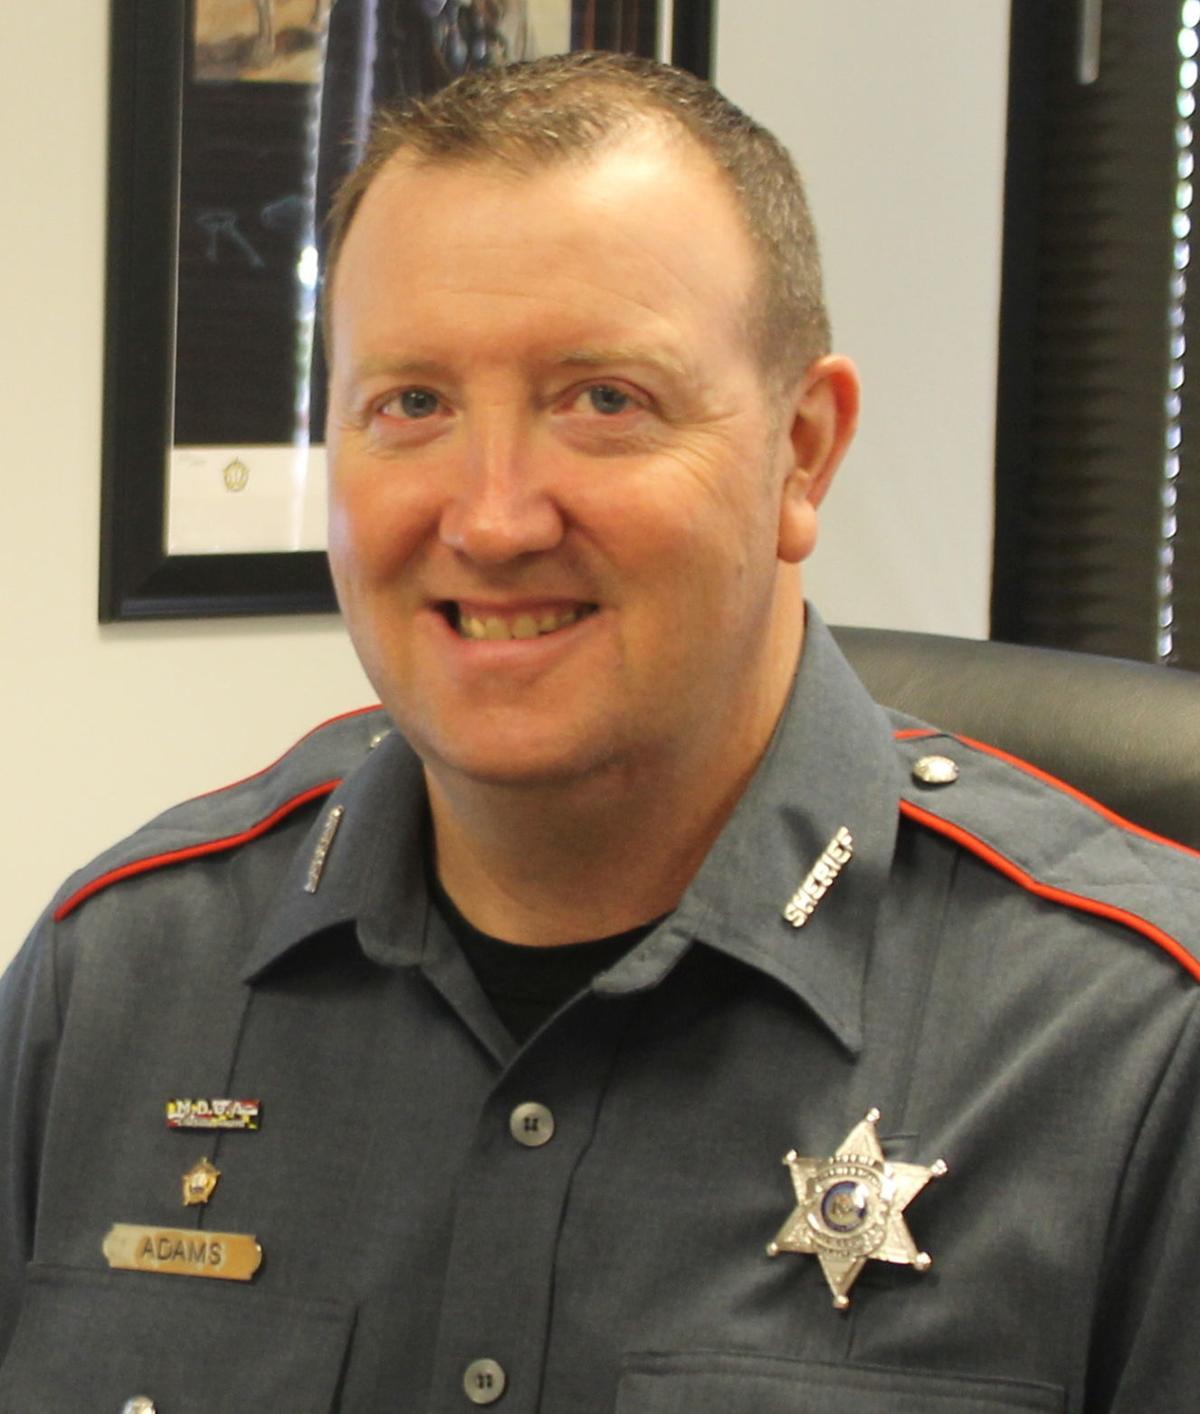 Sheriff Scott Adams